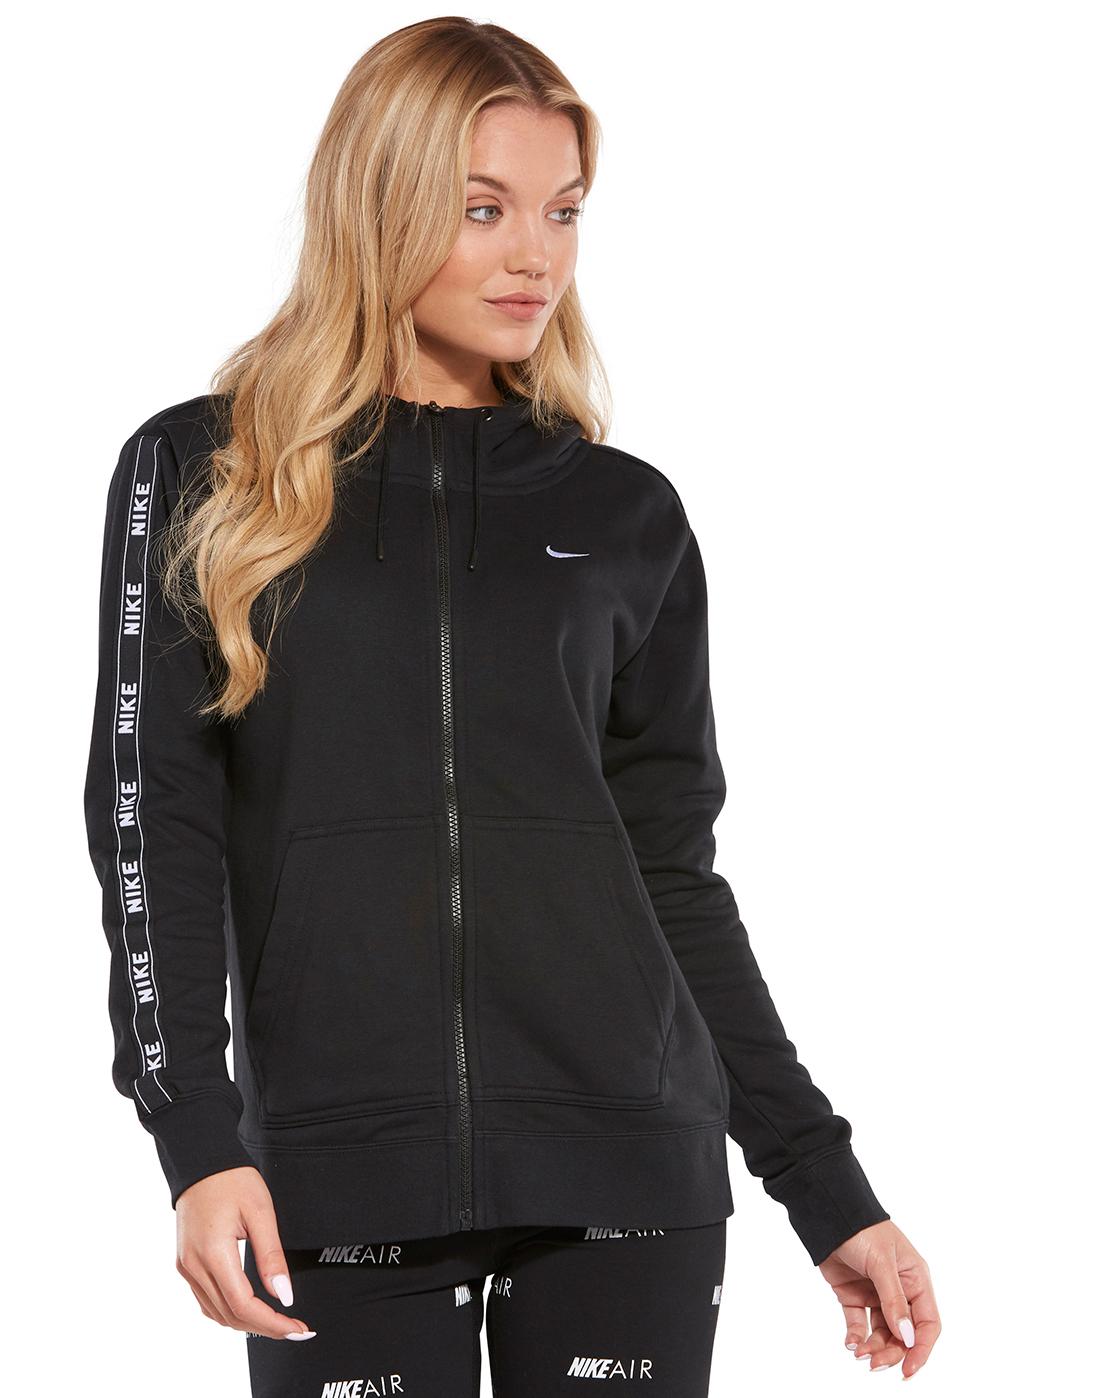 91400bfe3bf5 Women's Black Nike Tape Hoodie   Life Style Sports